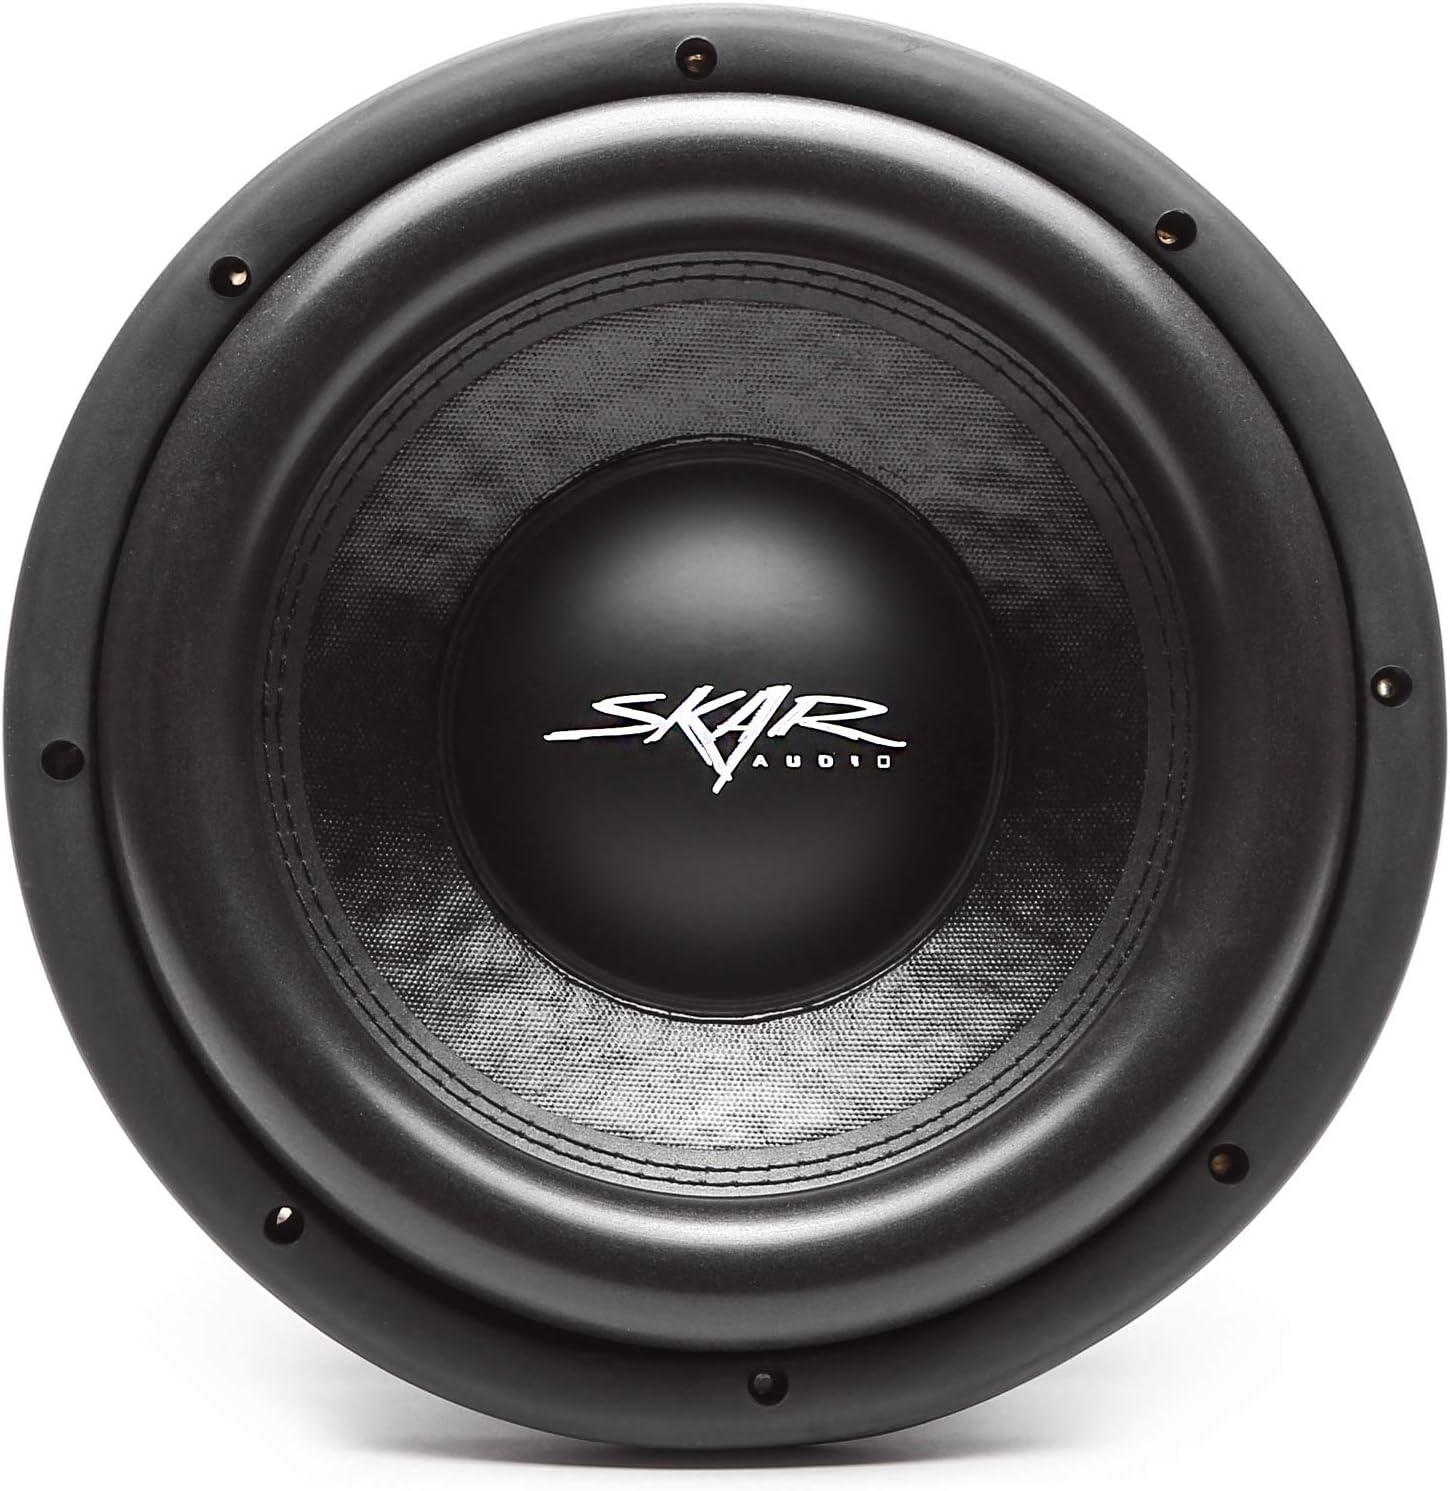 "NEW SKAR AUDIO VD-10 D4 10/"" 800 WATT MAX DUAL 4 OHM SHALLOW MOUNT CAR SUBWOOFER"